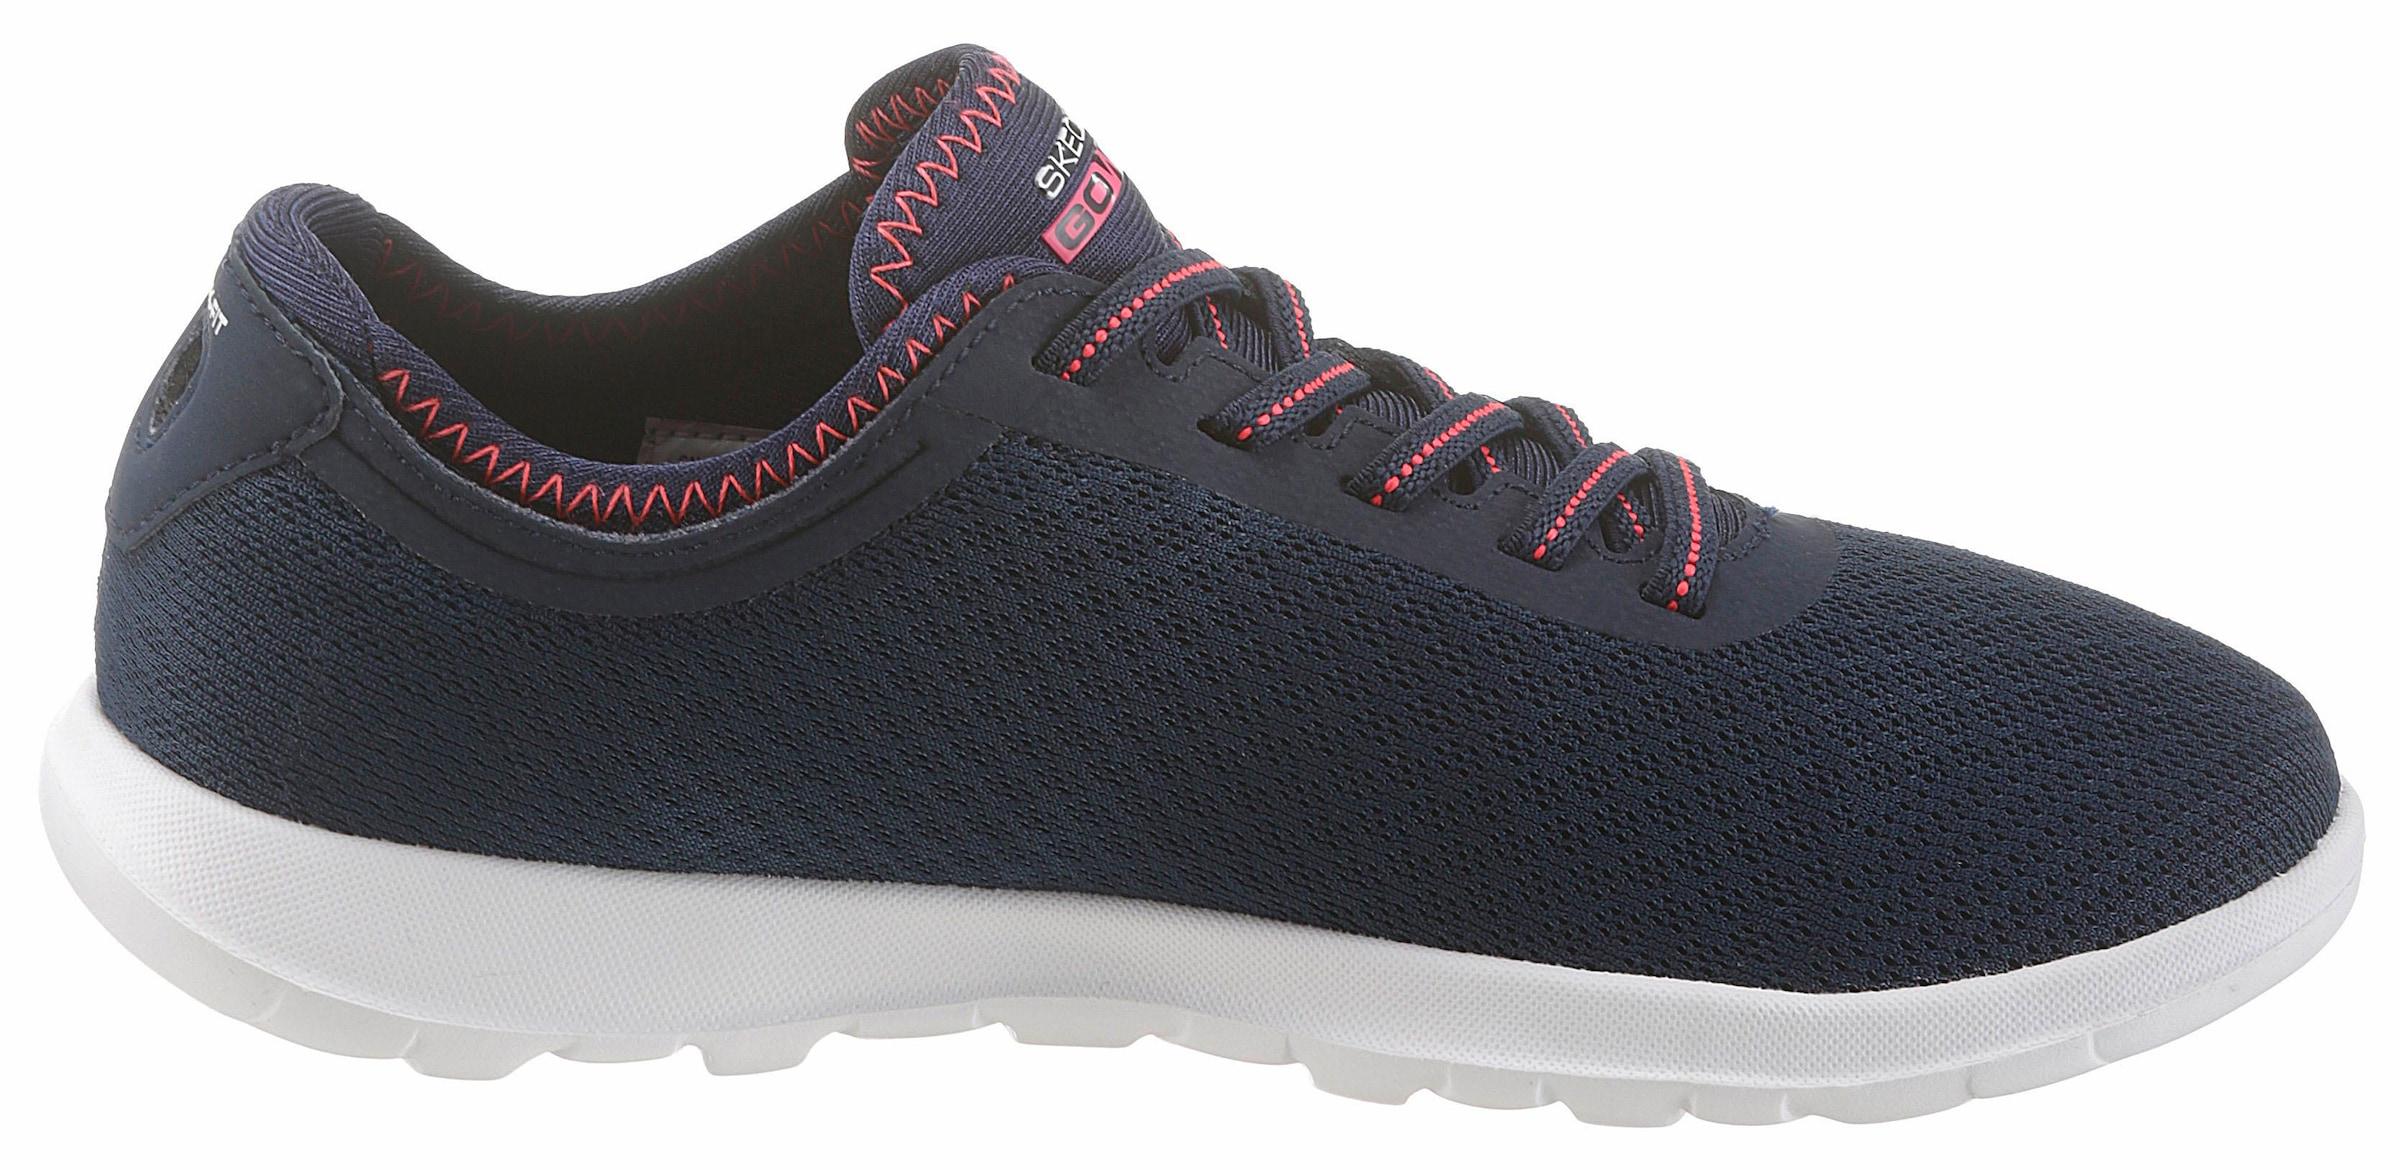 SKECHERS PERFORMANCE Slip-On Sneaker Impulse Go Walk Lite - Impulse Sneaker bestellen | Gutes Preis-Leistungs-Verhältnis, es lohnt sich 86dd85